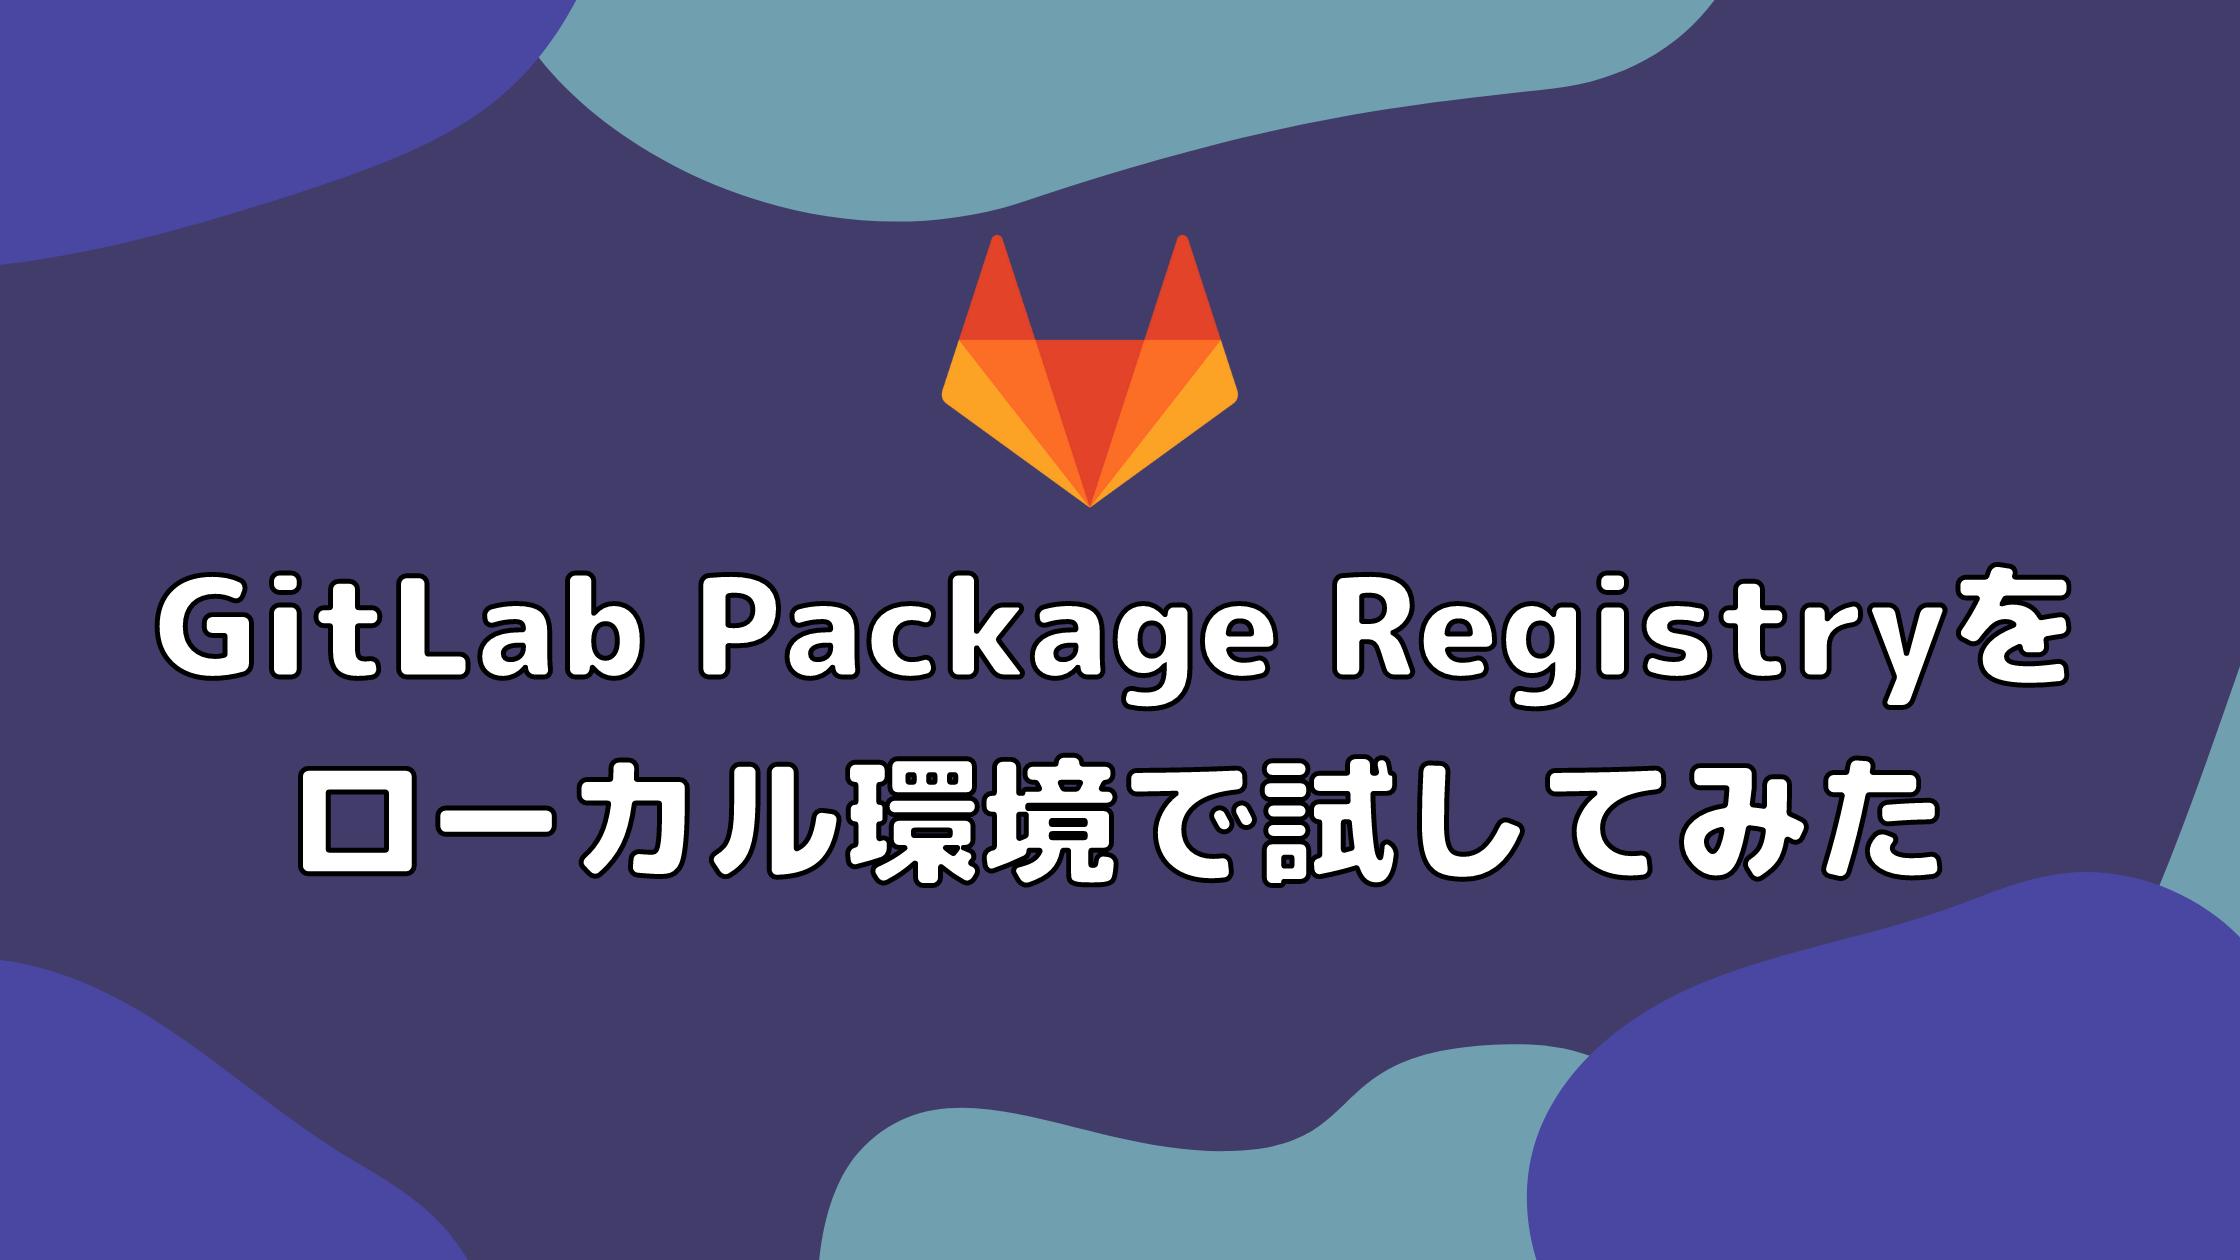 GitLab Package Registryをローカル環境で試してみた